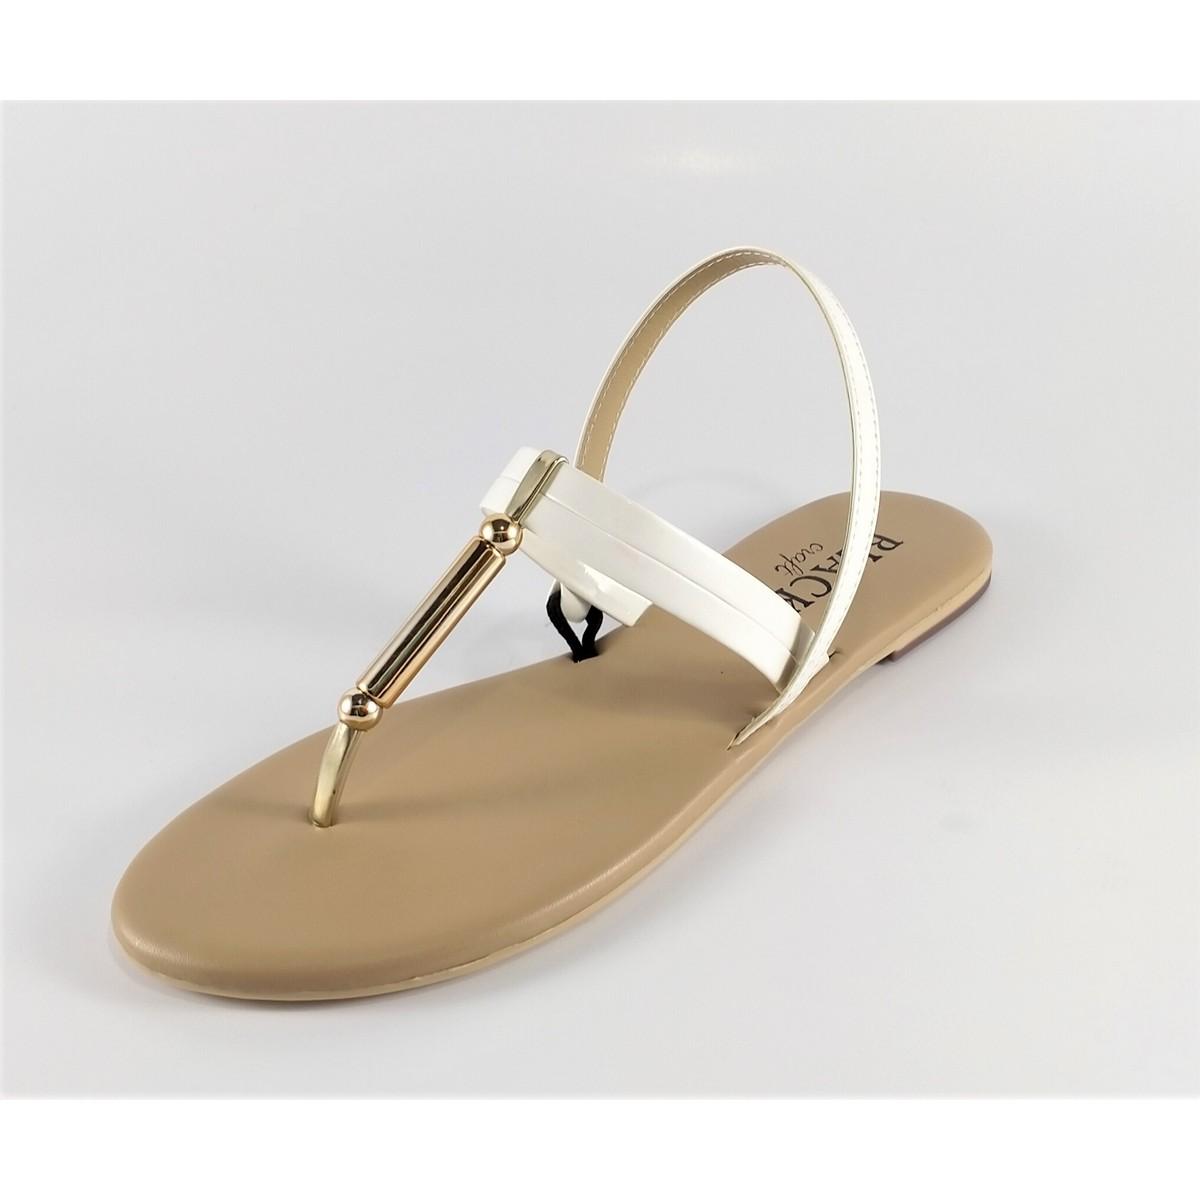 Flat Sandals - Women - T-Strap Sandal - Soft - Comfortable - White